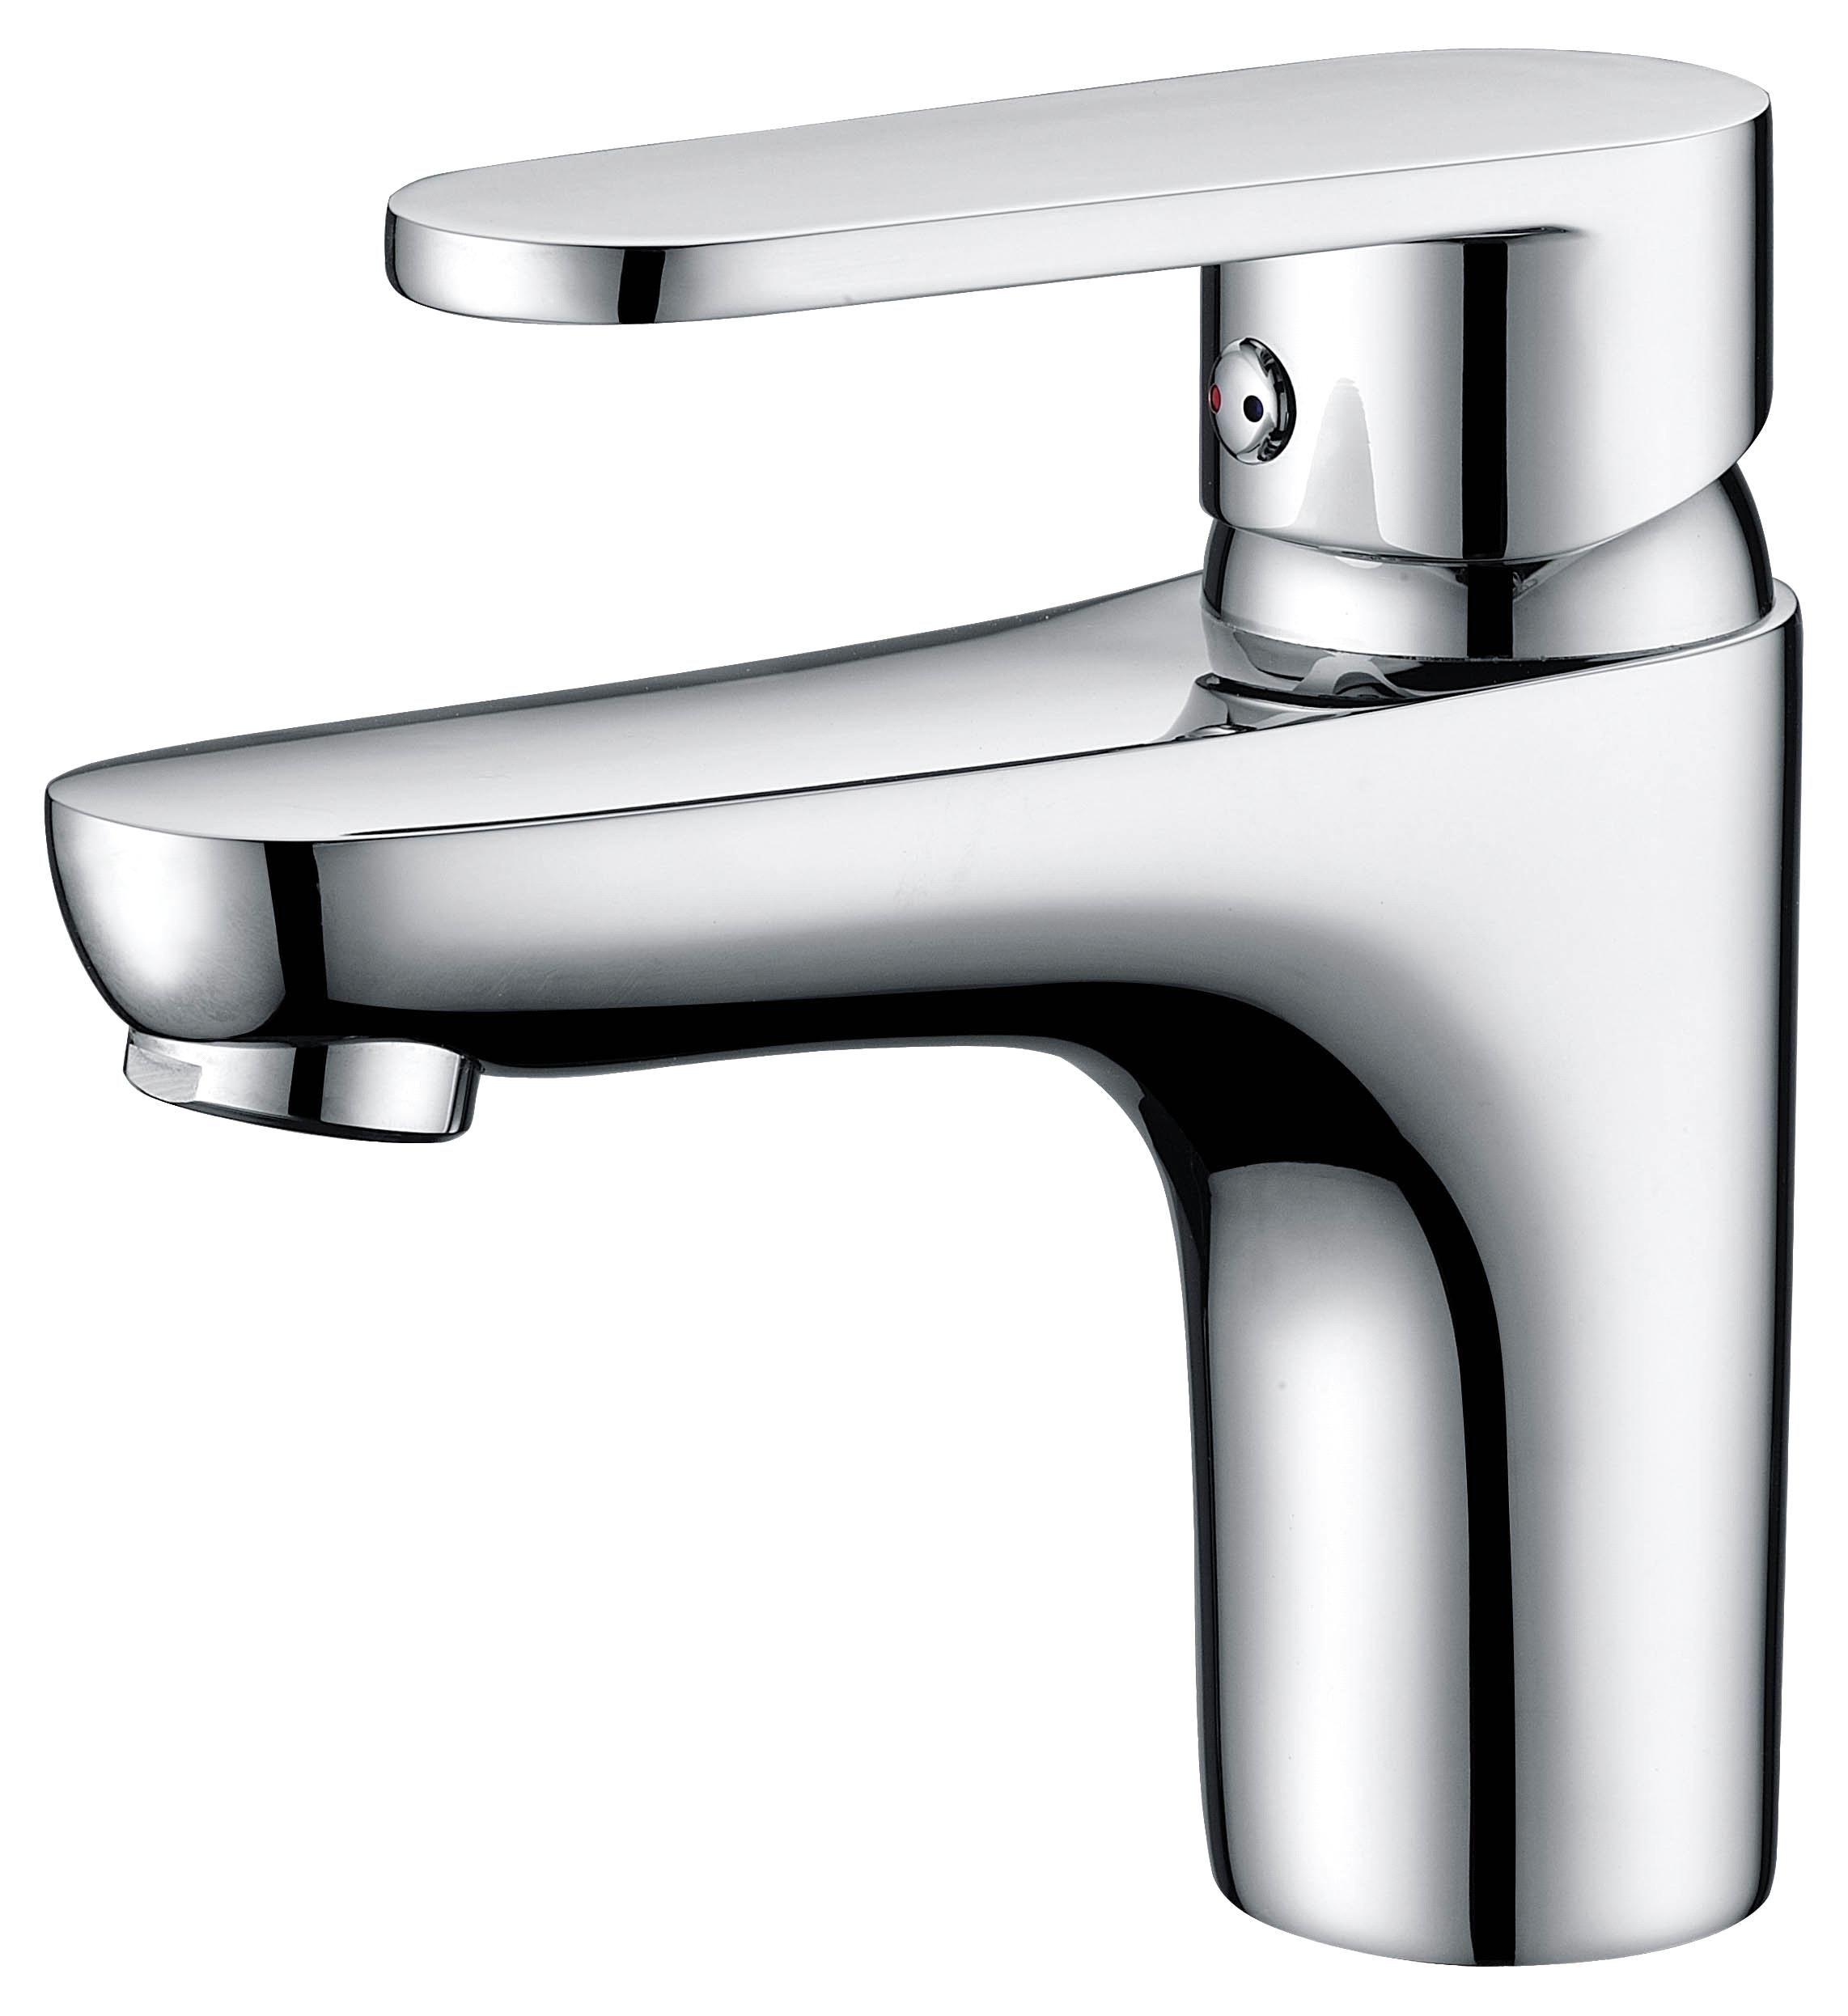 brass faucet-Single handle basin mixer-JHF138C (JHF138C) - China ...